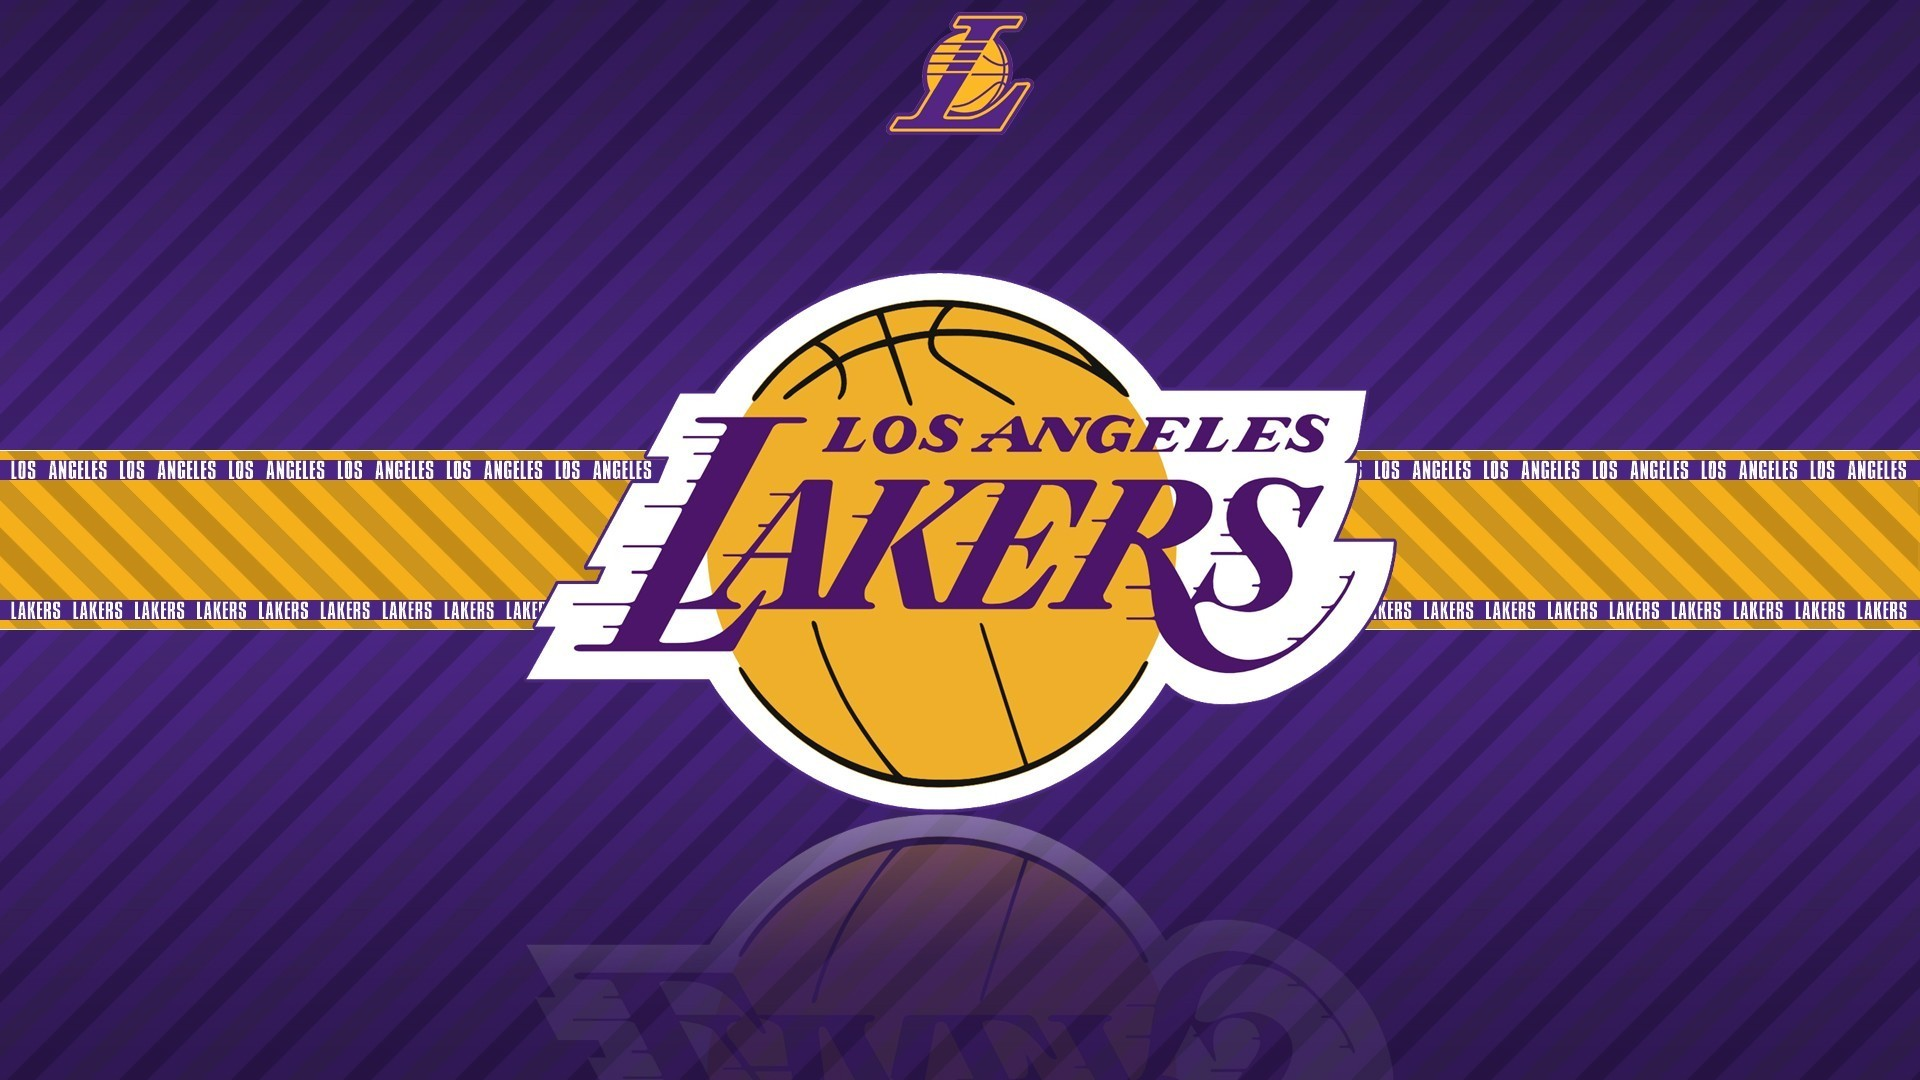 Los Angeles Lakers Wallpaper HD 2020 Basketball Wallpaper 1920x1080